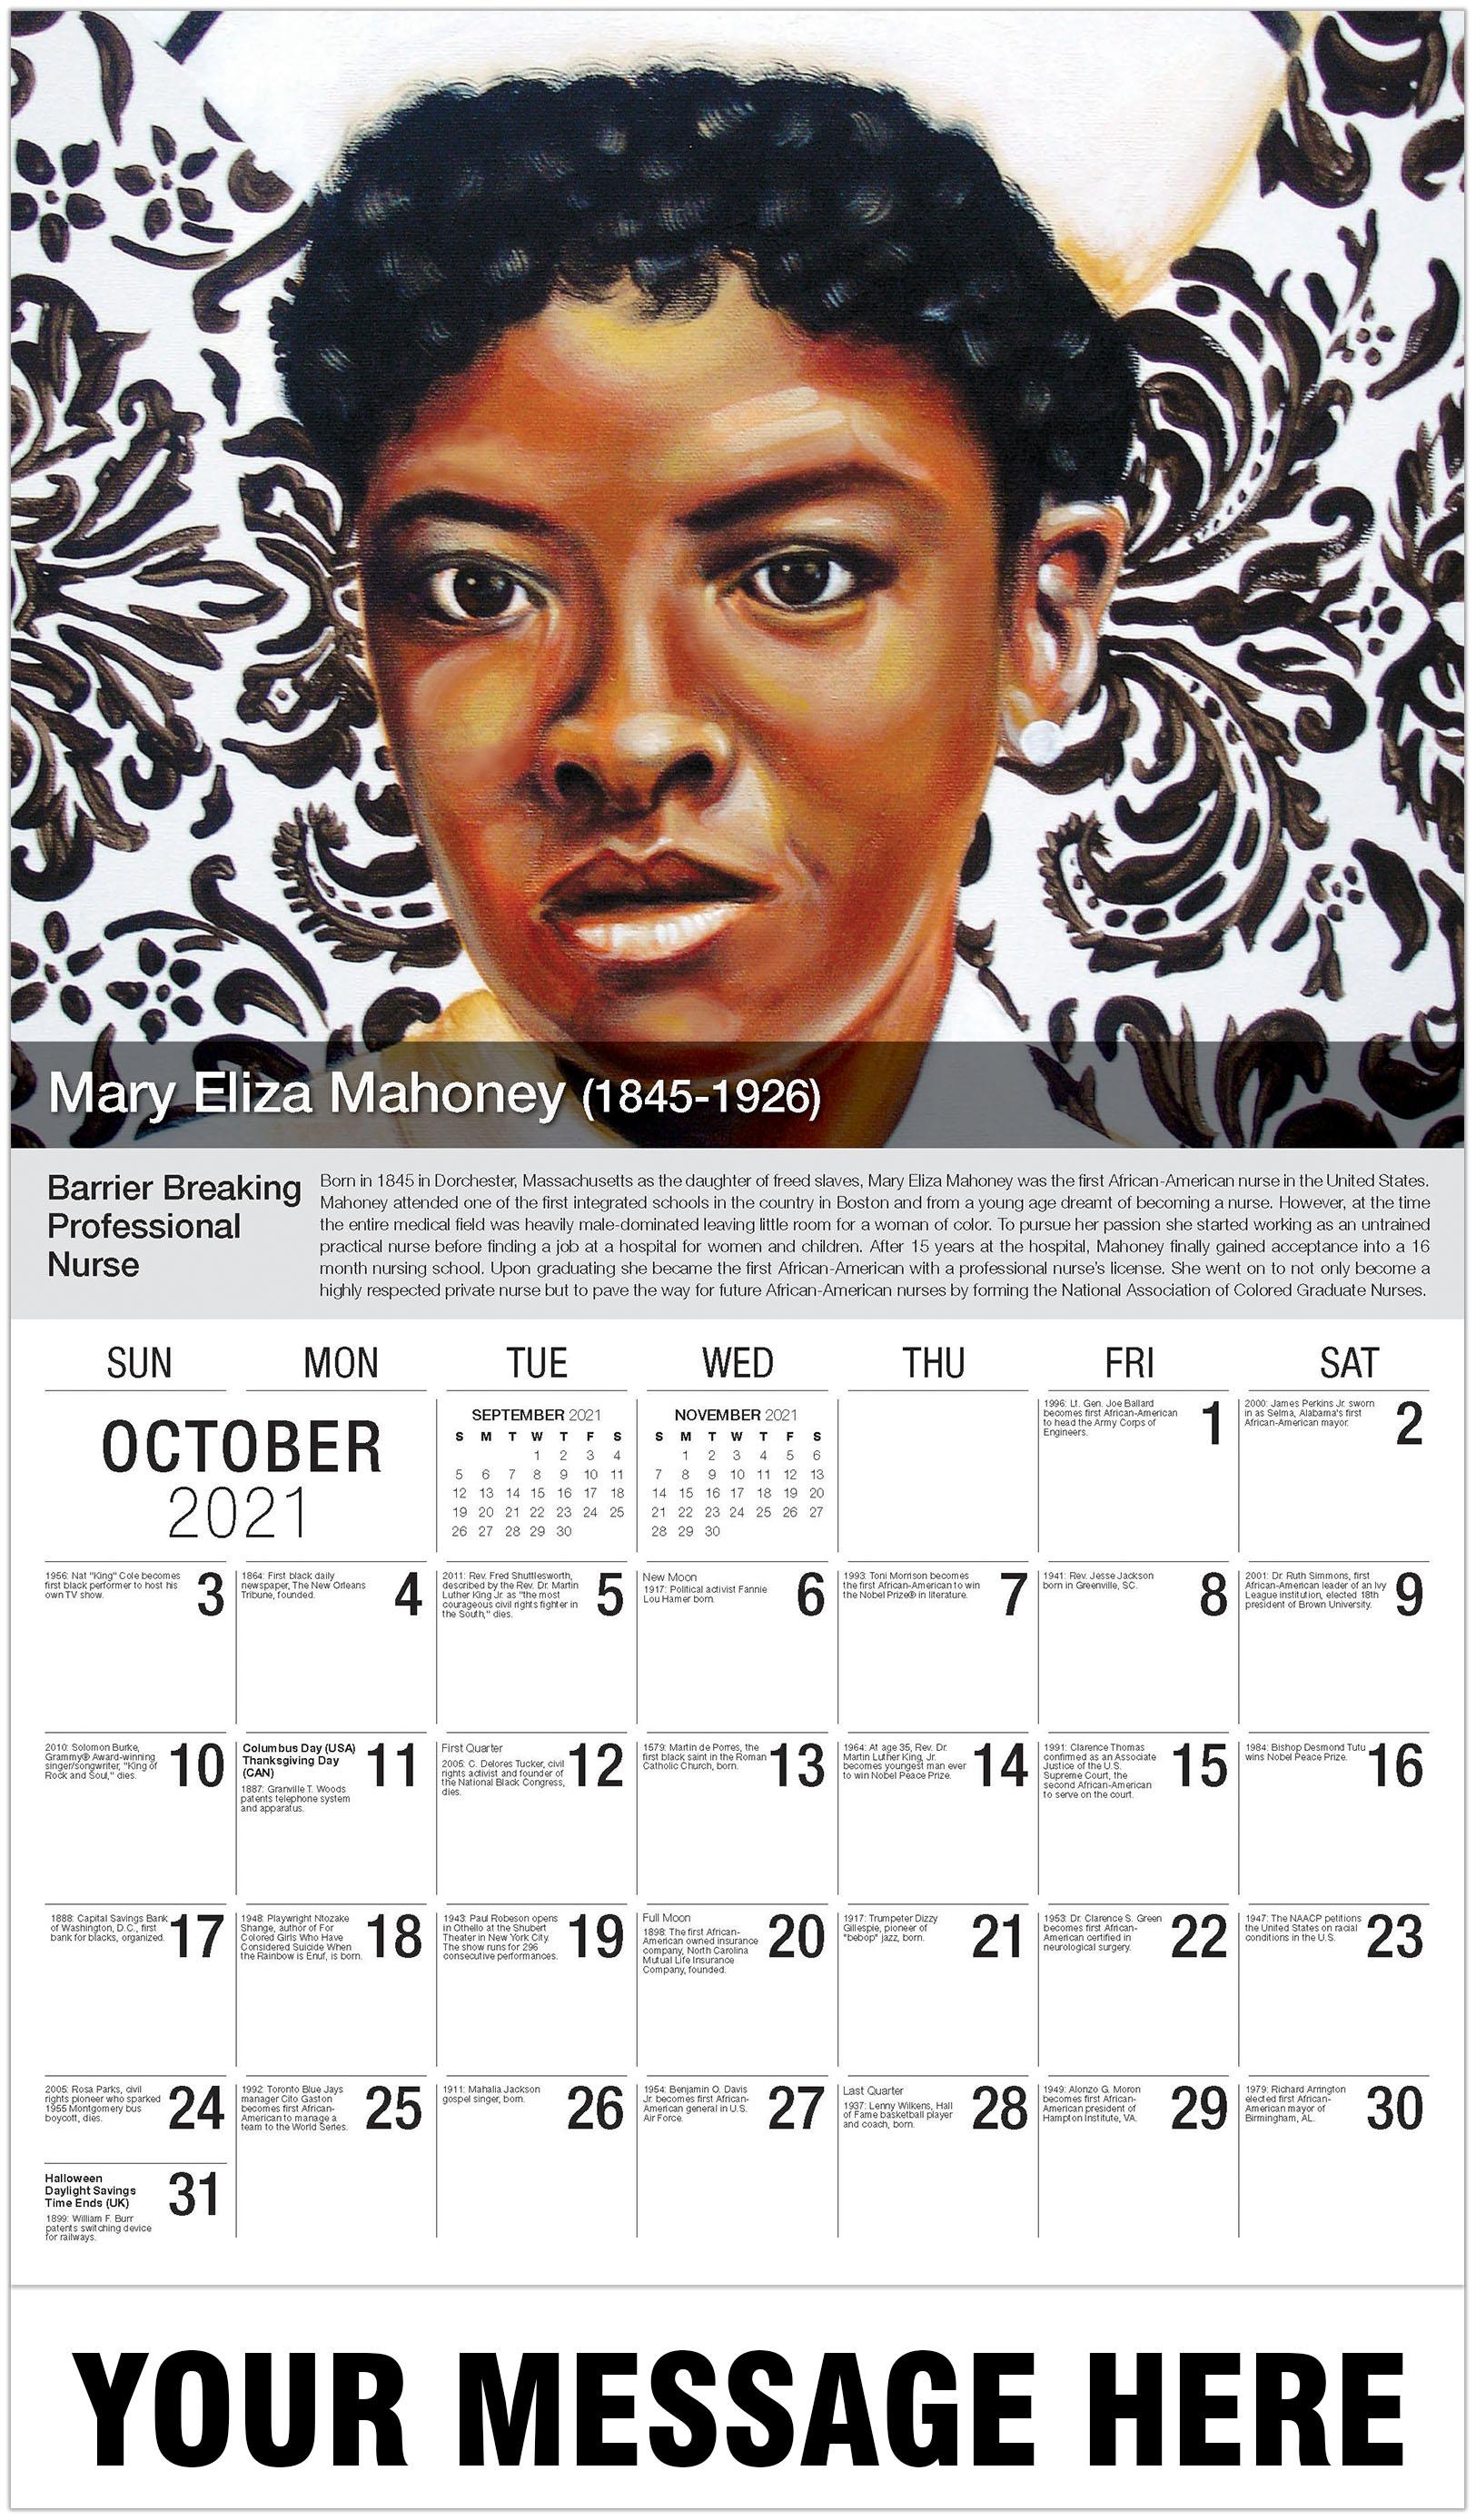 Mary Eliza Mahoney - October - Black History 2021 Promotional Calendar